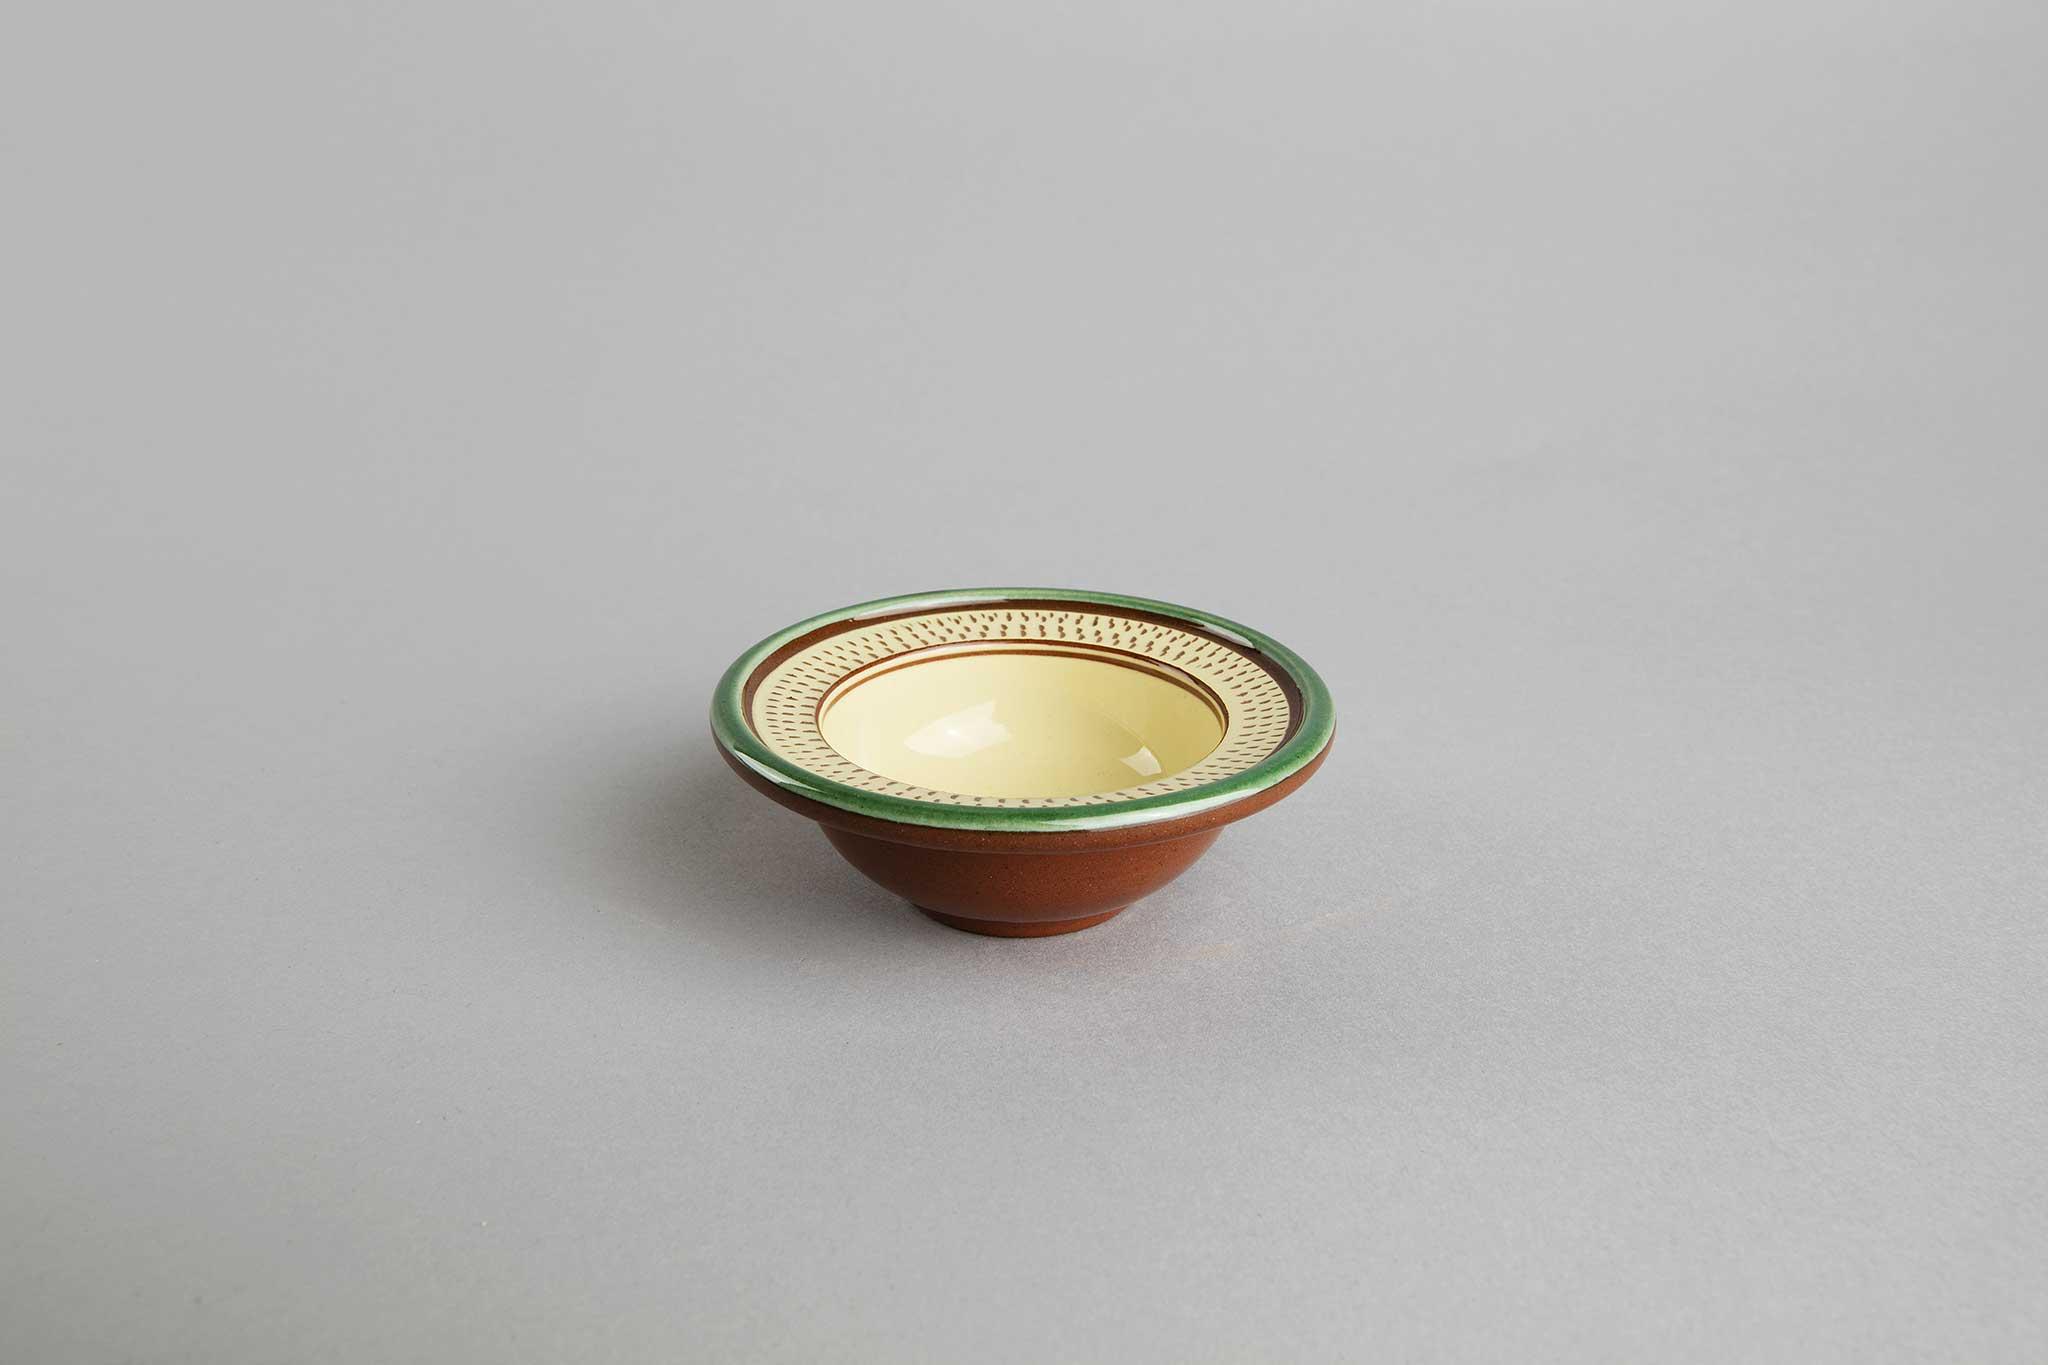 Saltskål, lys, Hammerkrok fra Potteriet Røros. Foto: Tom Gustavsen